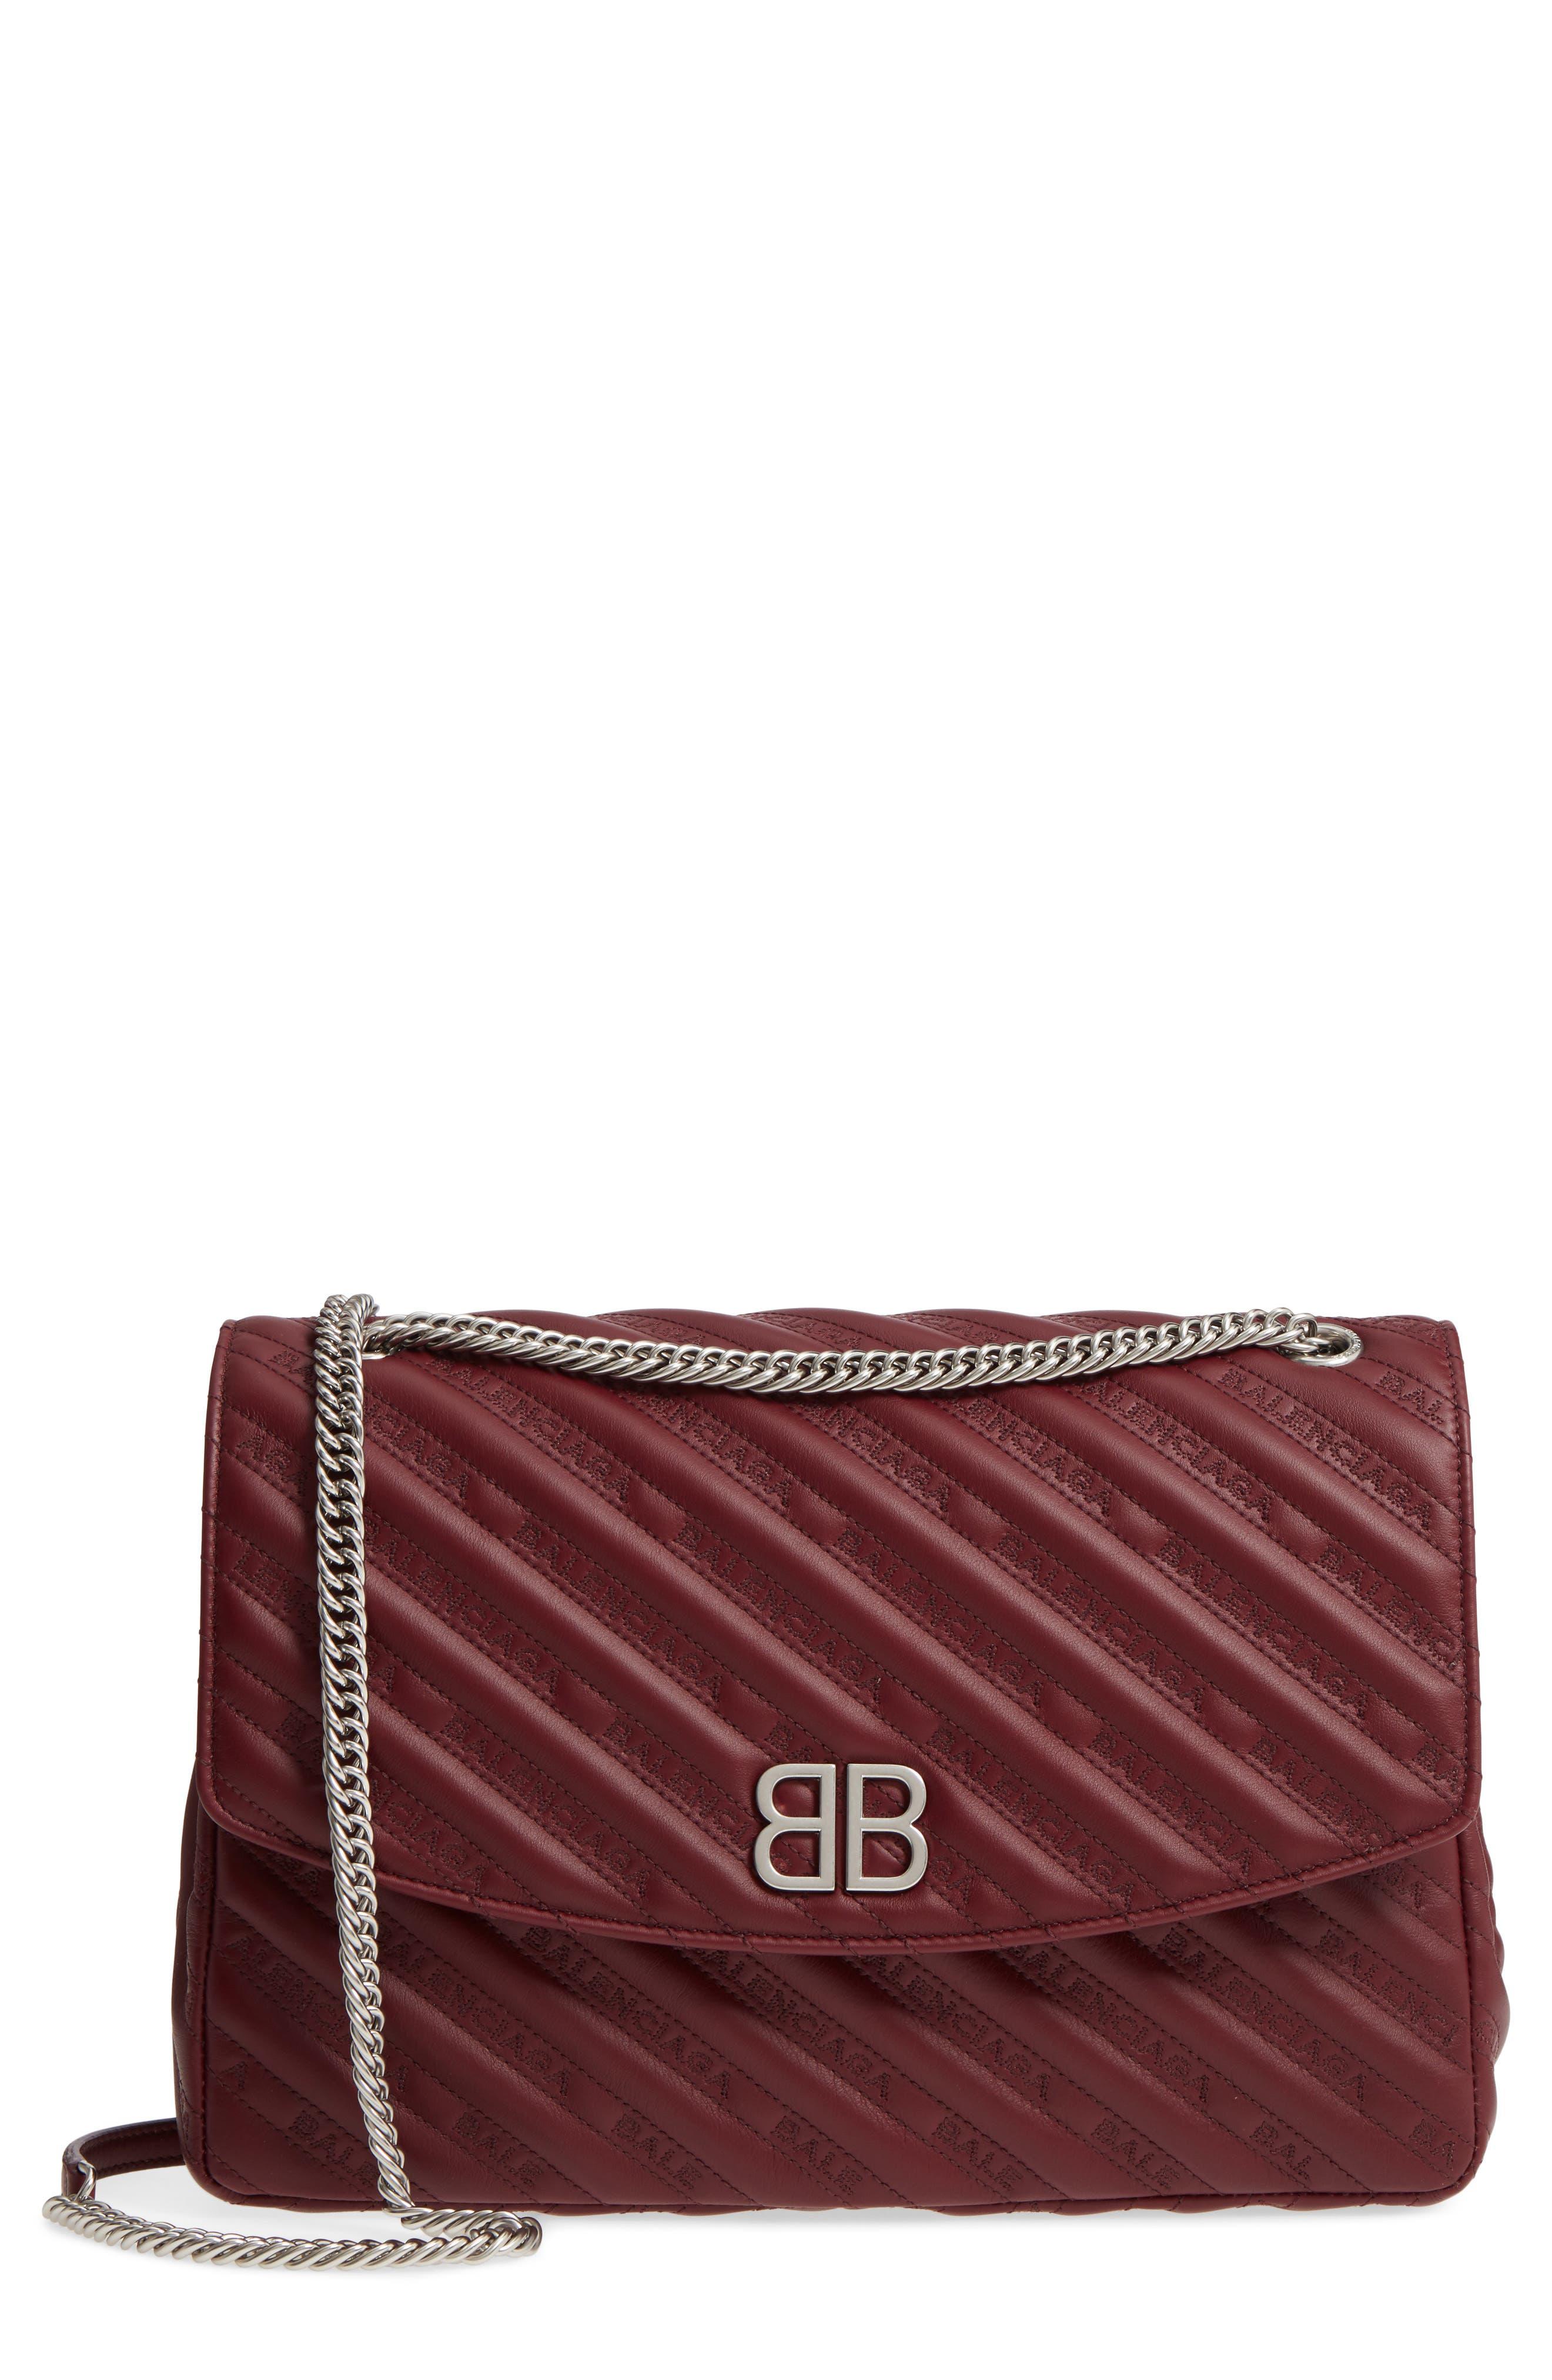 Alternate Image 1 Selected - Balenciaga Matelassé Calfskin Leather Shoulder Bag